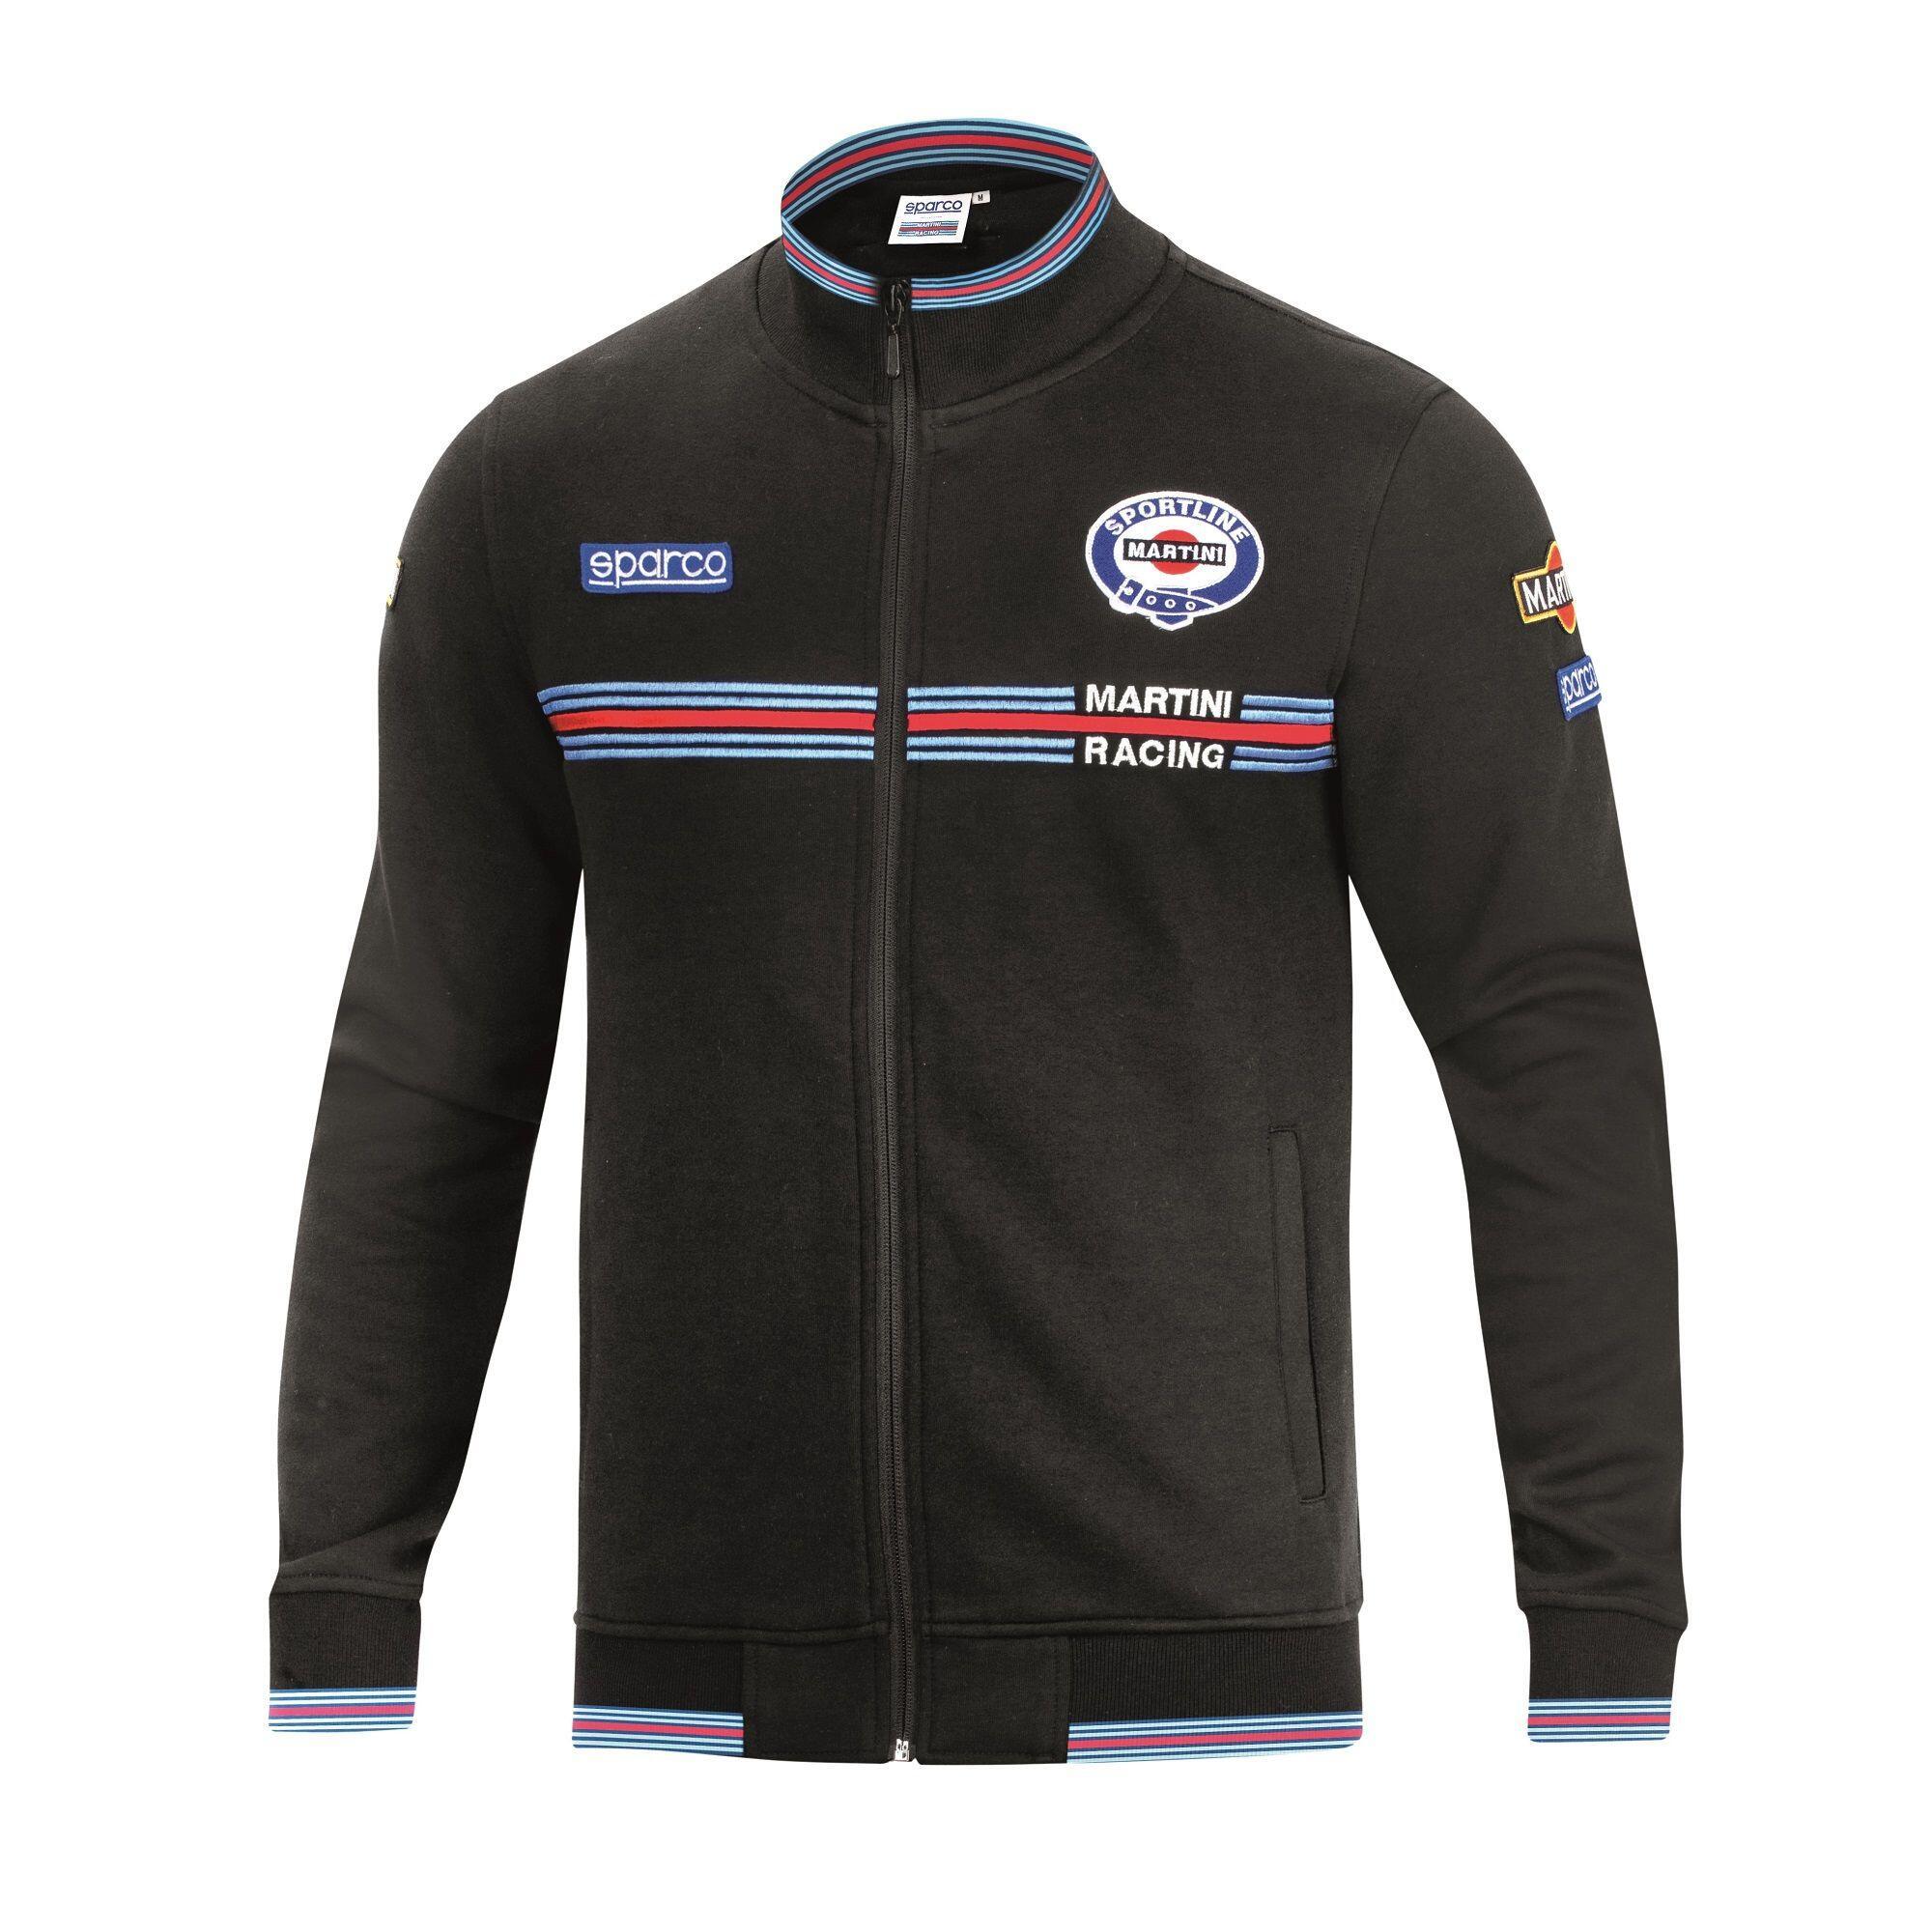 Sparco Full Zip Sweatshirt Martini Racing Black